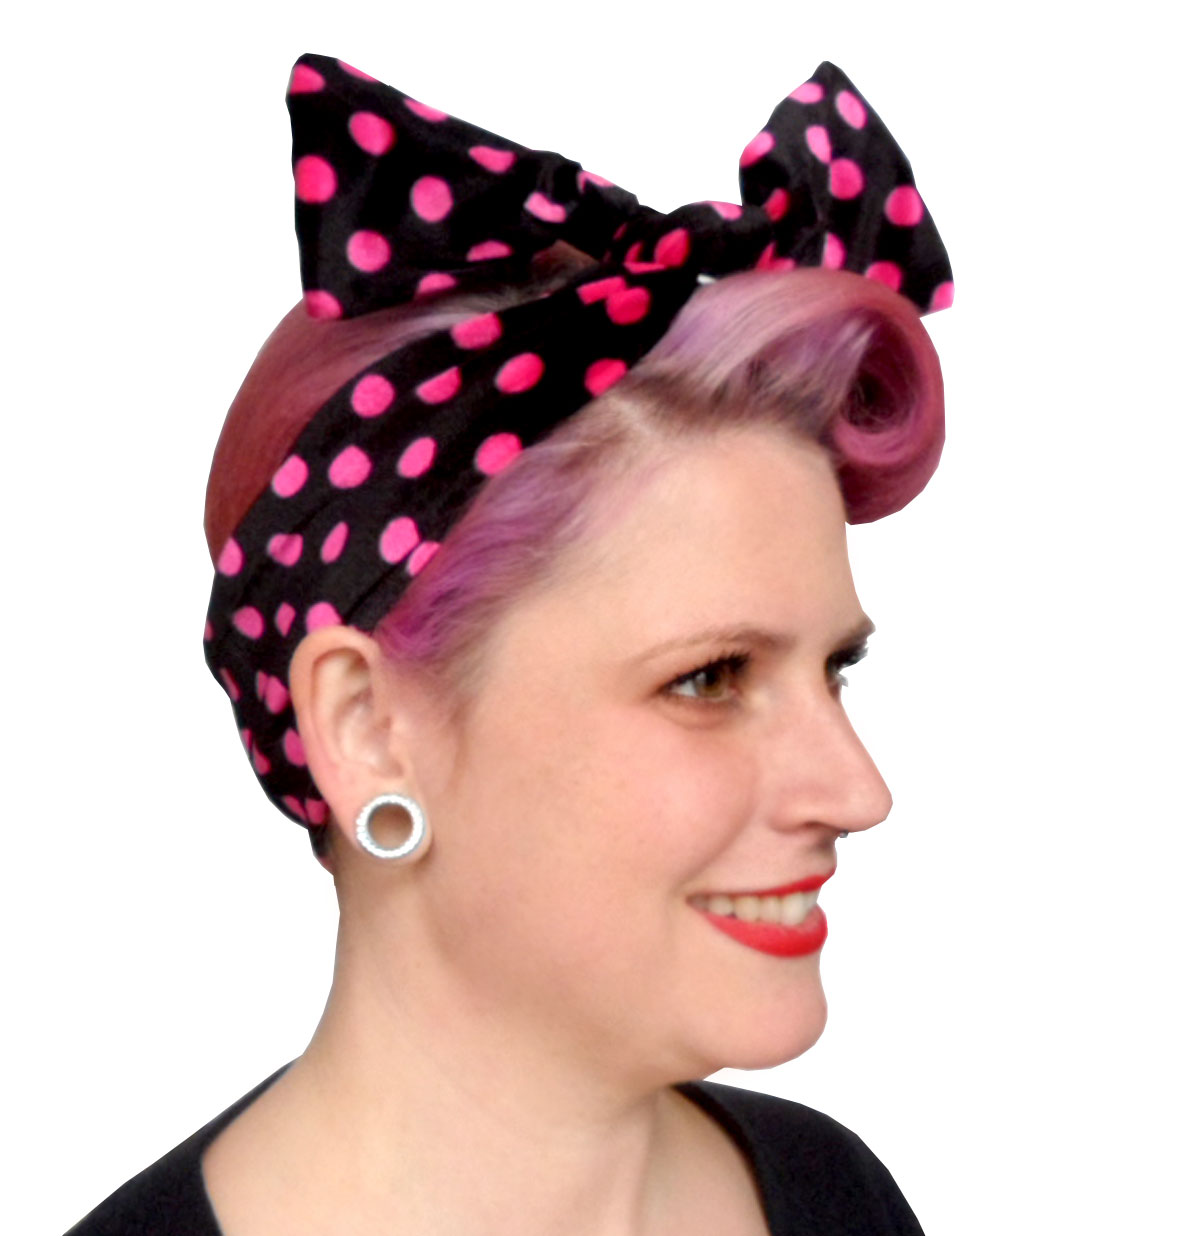 Velvet Headband Black/Pink Dots